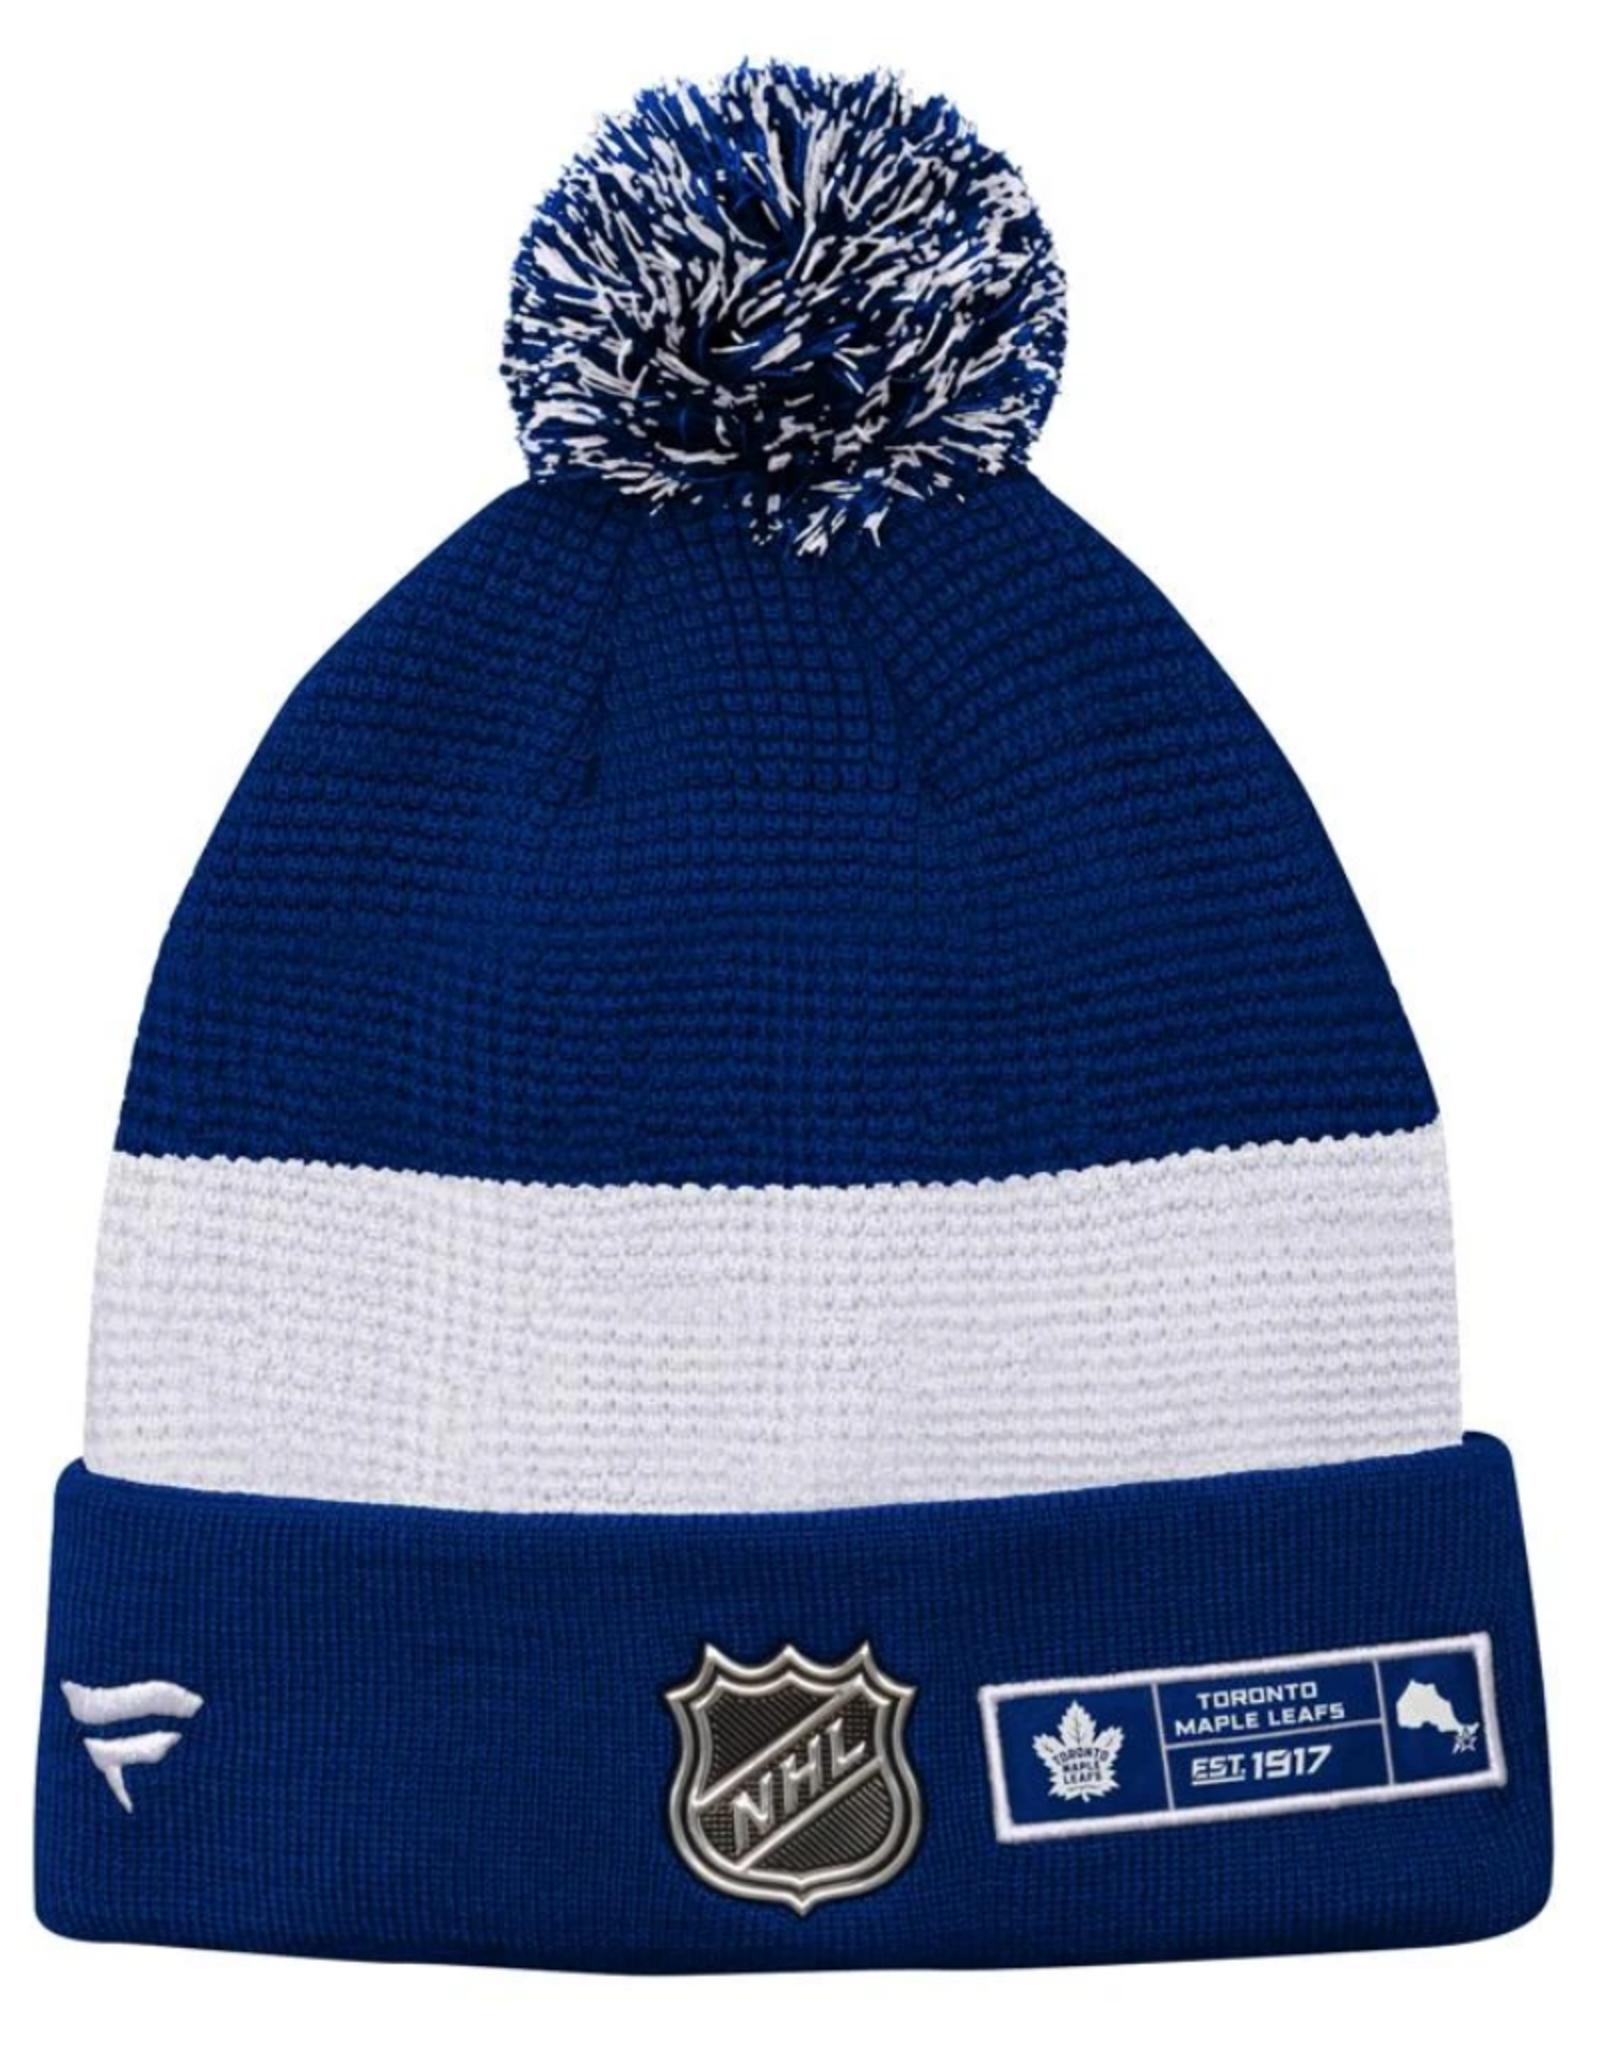 Fanatics Fanatics Men's Locker Room '20 Draft Knit Toronto Maple Leafs Blue